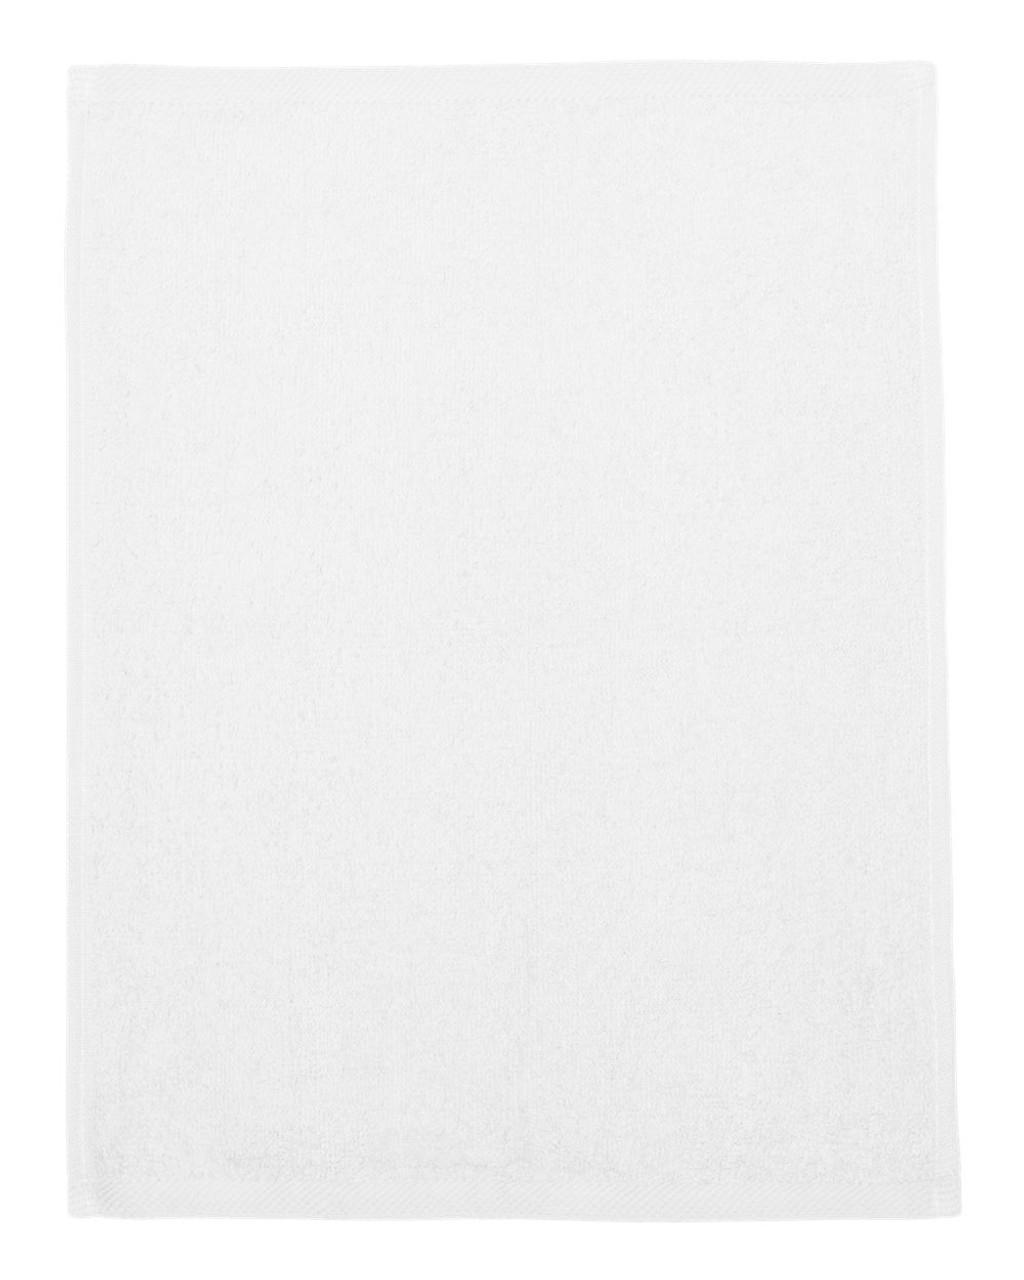 T600 Q-Tees Hemmed Fingertip Towel | T-shirt.ca